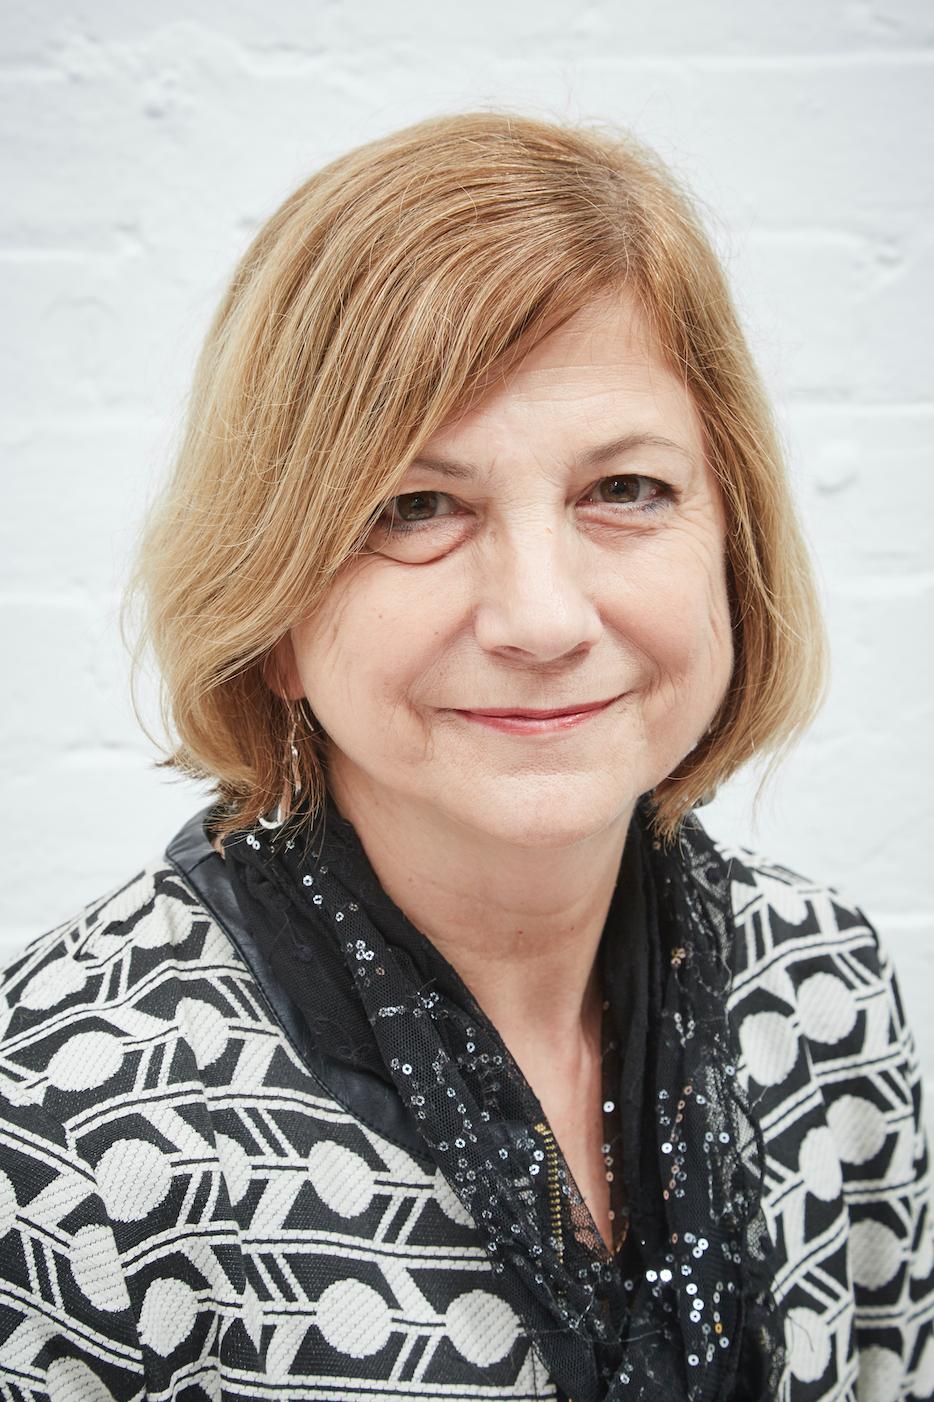 Jackie Hunter BenevolentAI - Innovation in Drug Development